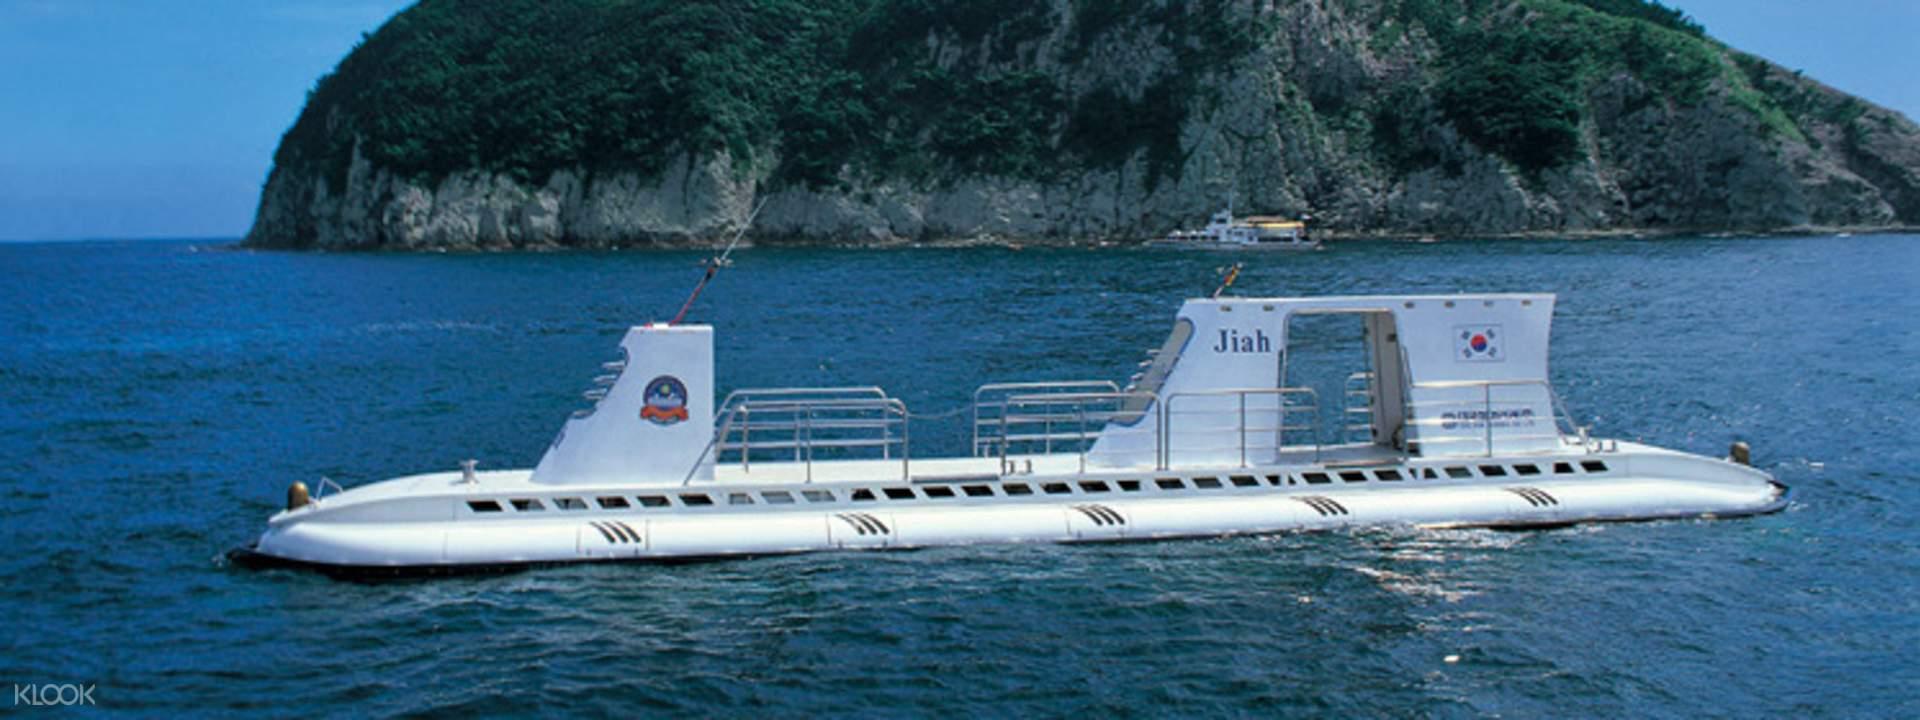 Seogwipo Submarine Adventure - Klook